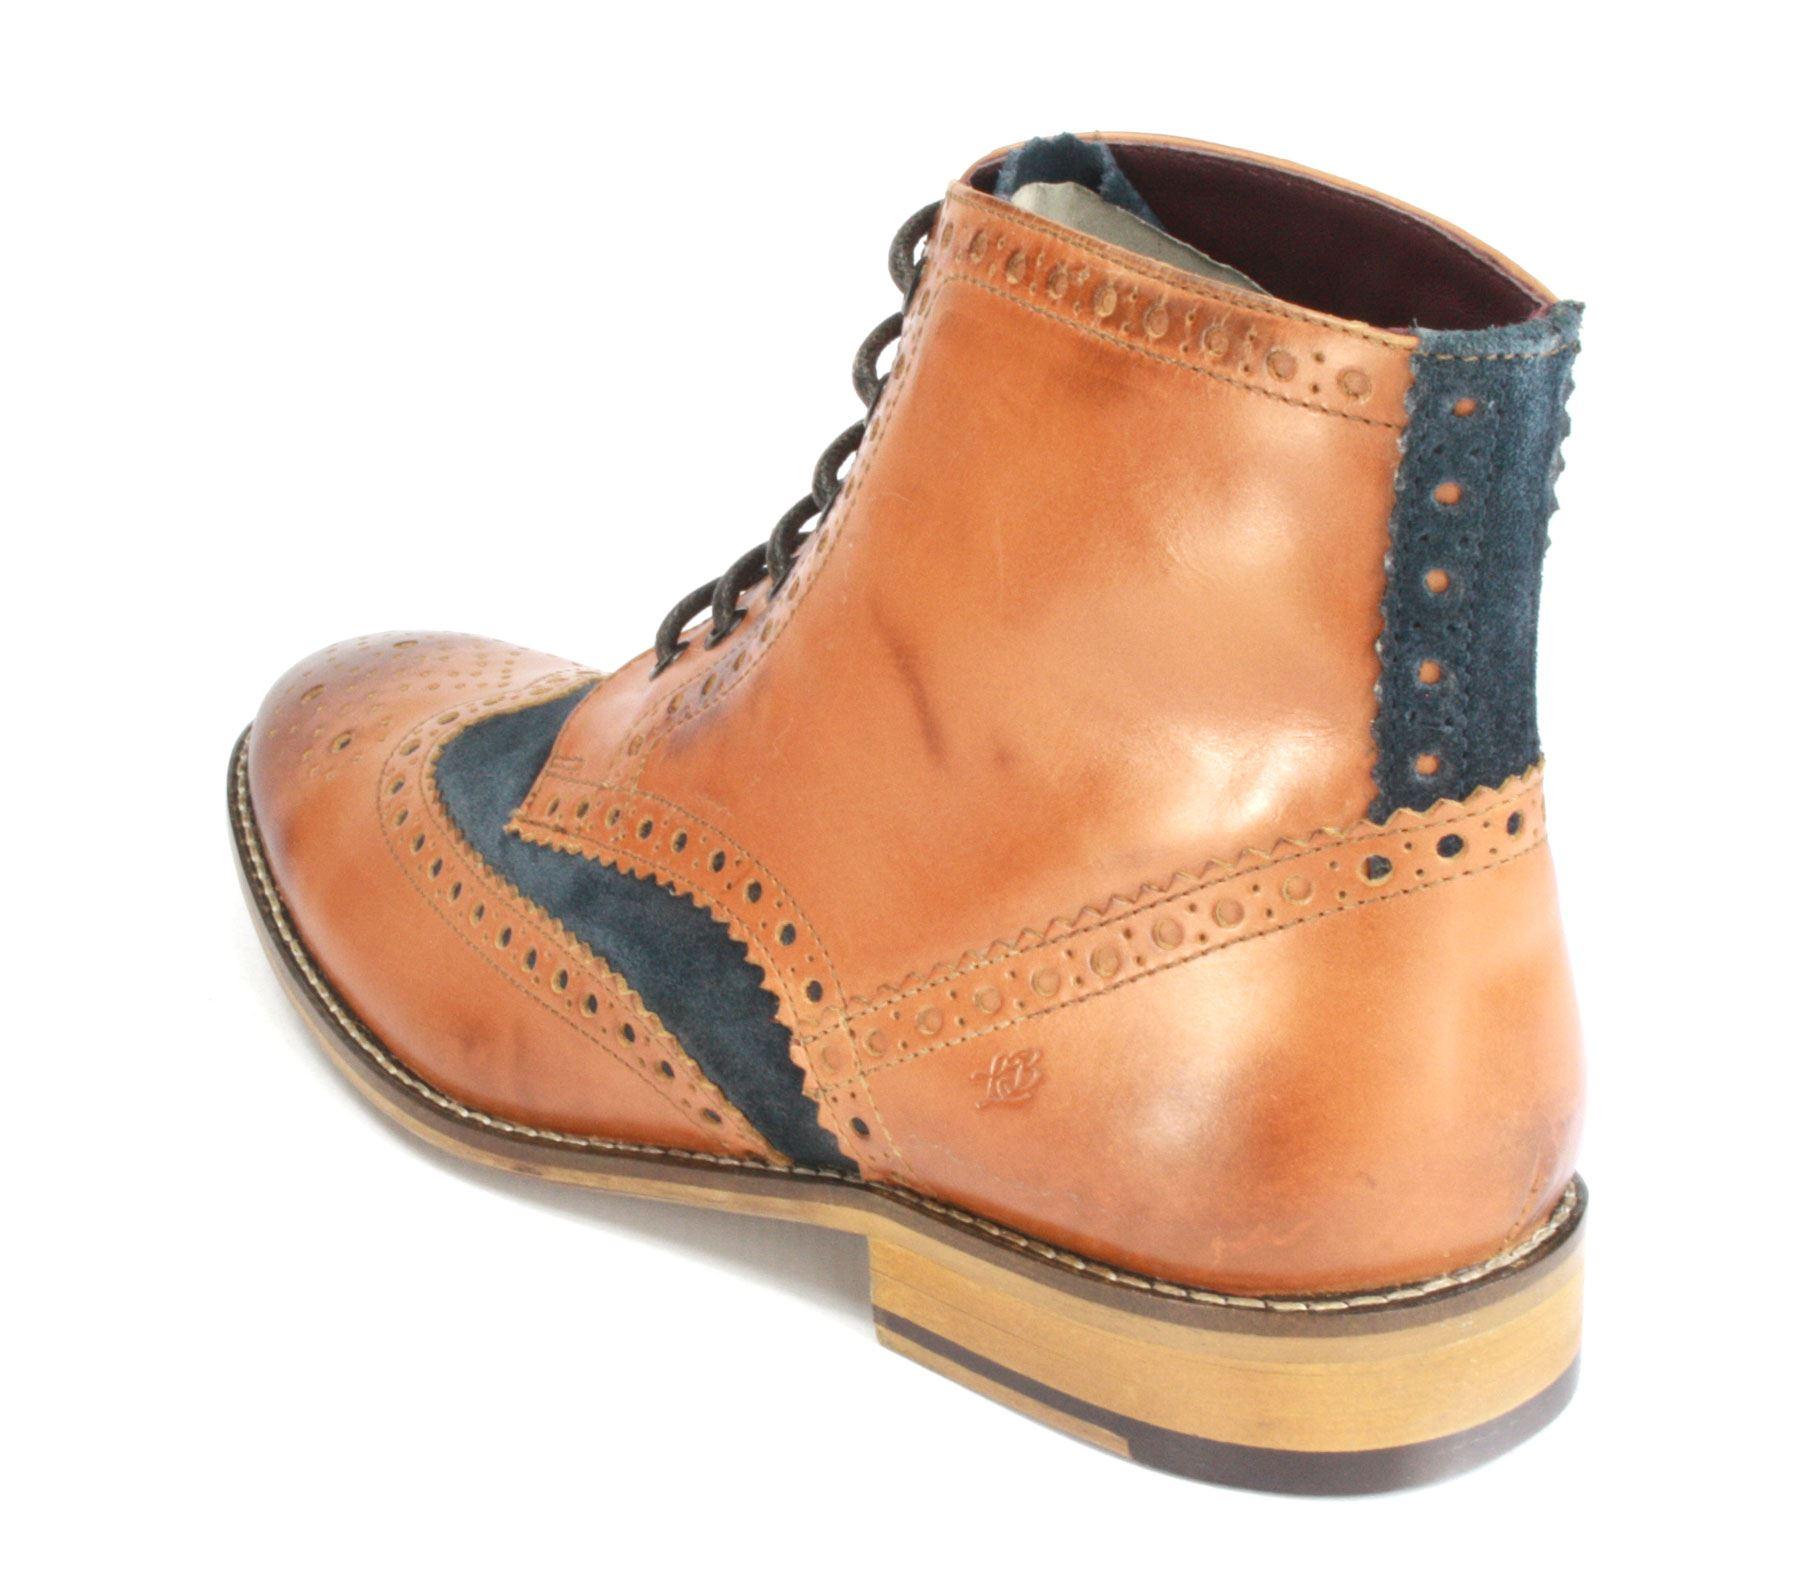 London Brogues  Uomo Leder Lace Up Wingtip Stiefel Formal GATSBY Hi Brogue Stiefel Wingtip 97dbb8